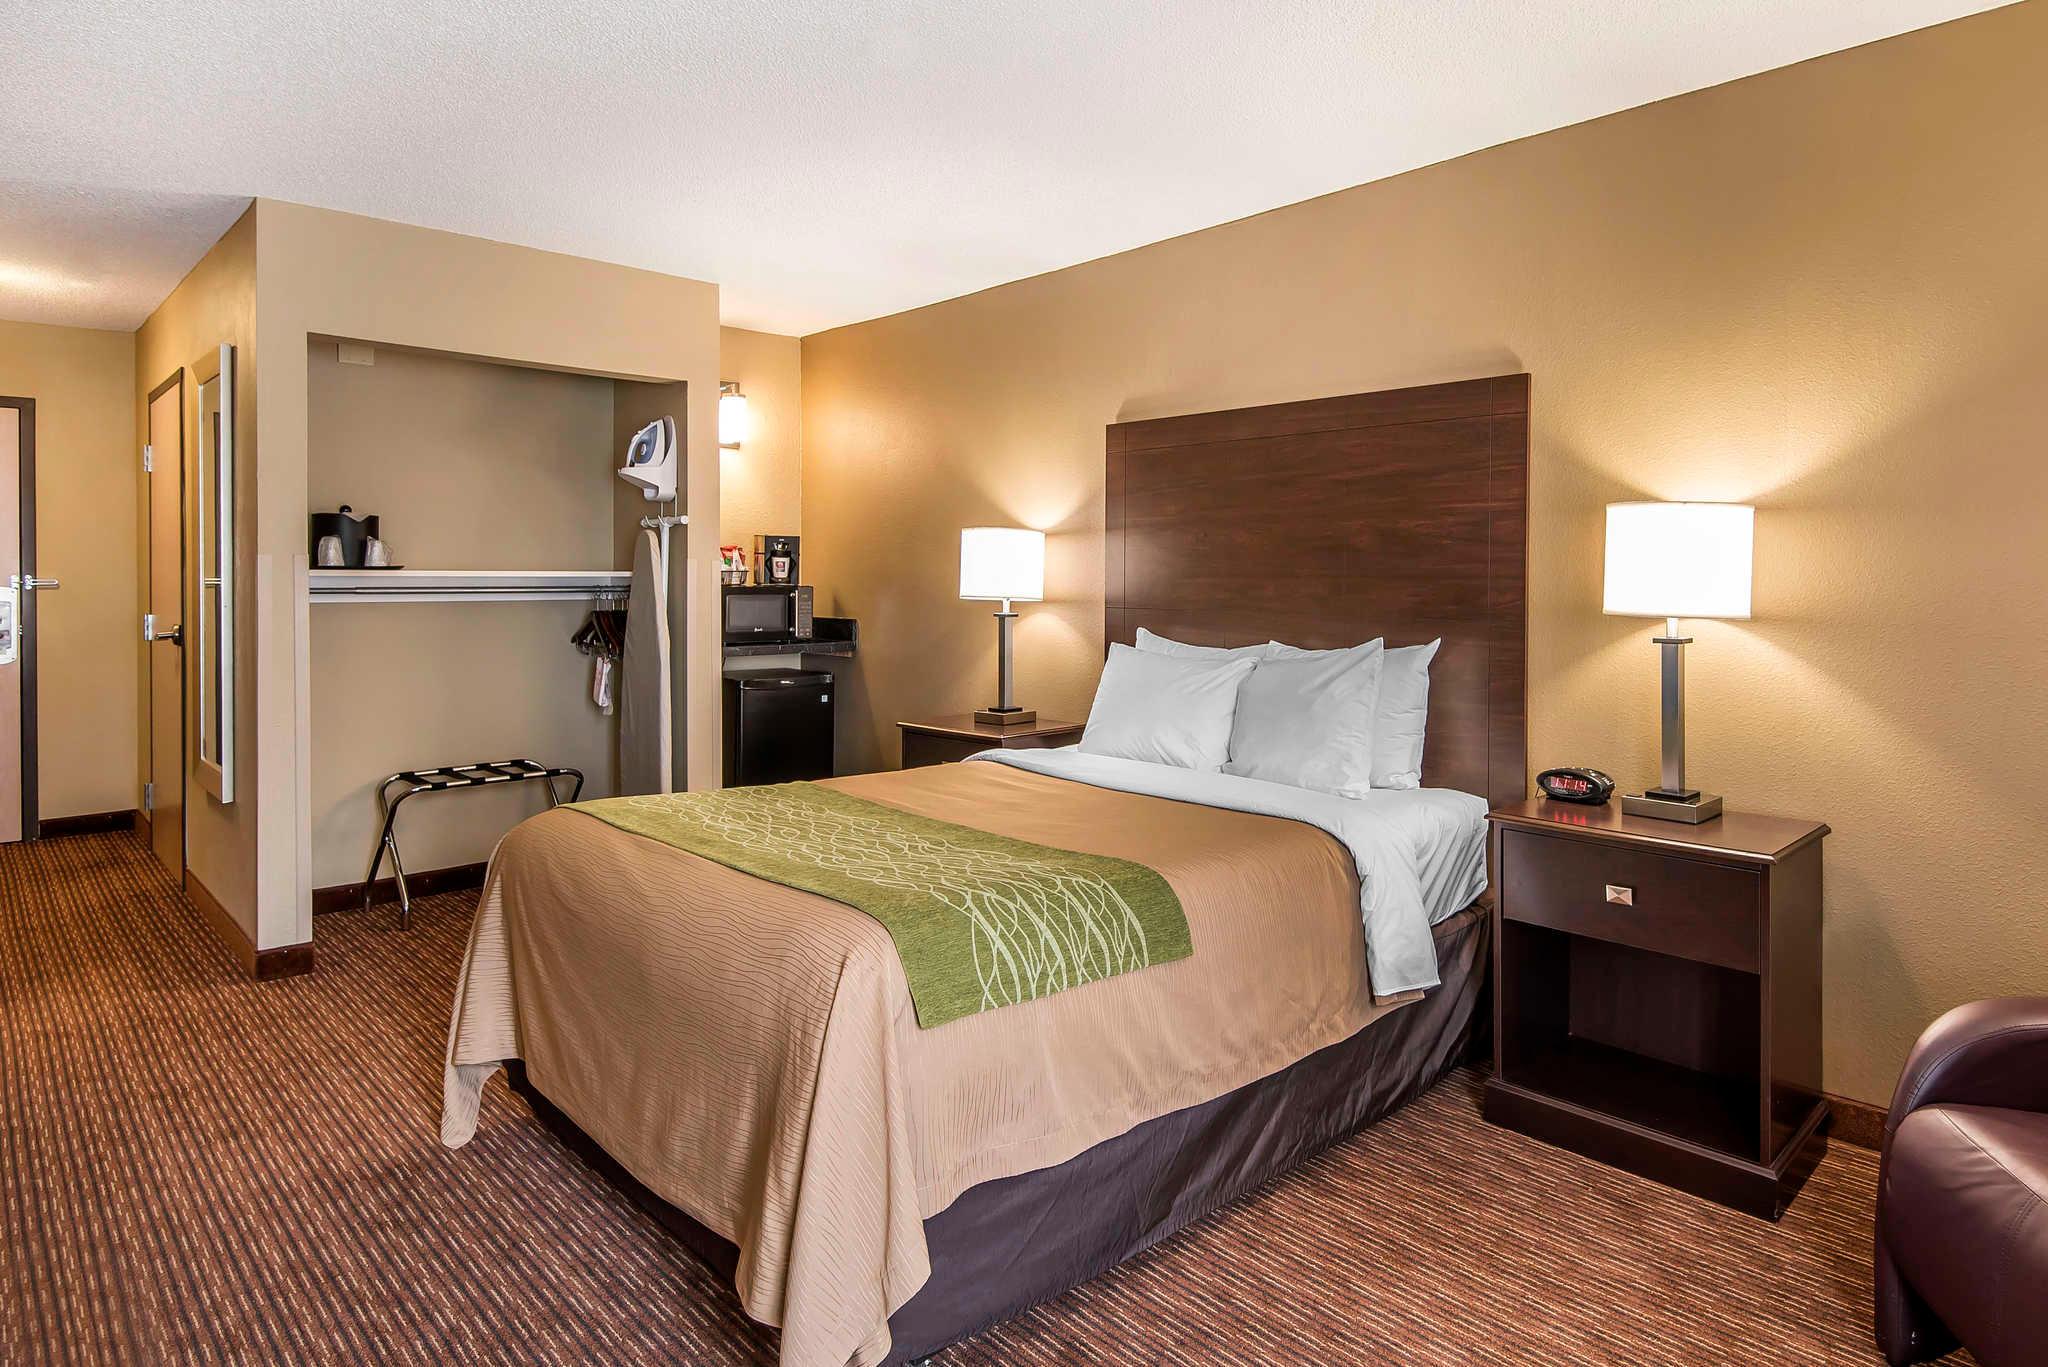 Comfort Inn & Suites Kansas City - Northeast image 9